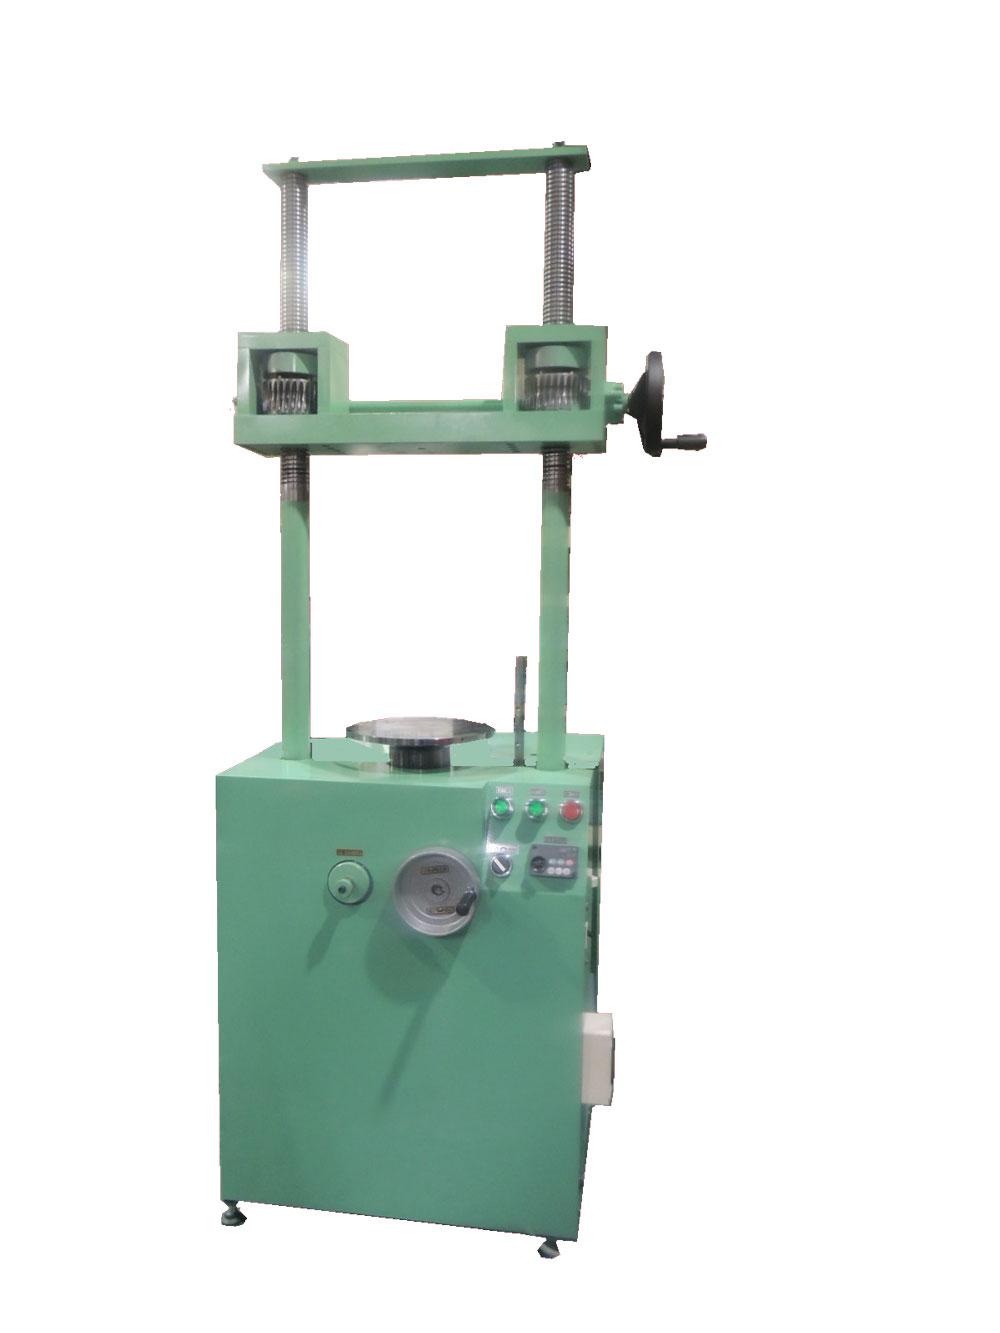 CBR試験2本柱式載荷装置 最大能力100kN